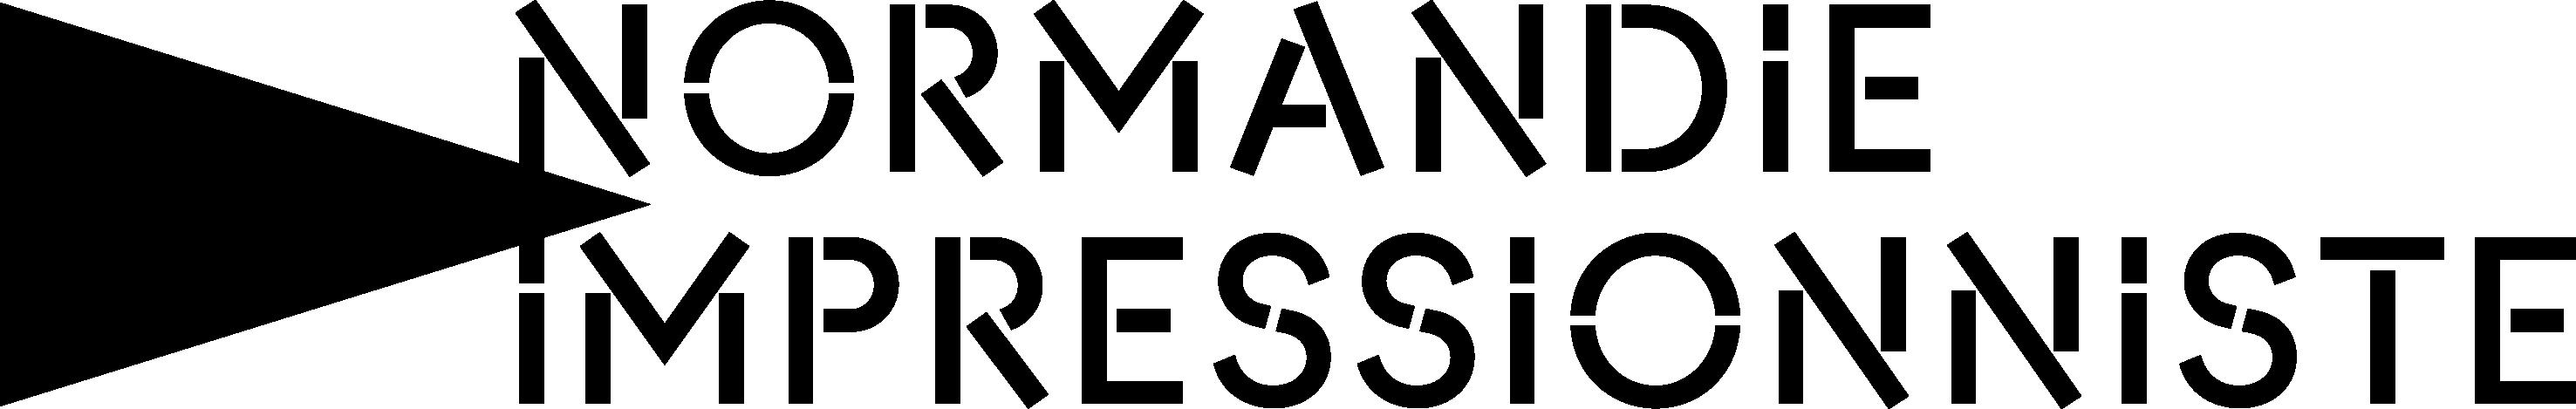 Logo Normandie impressionniste 2020